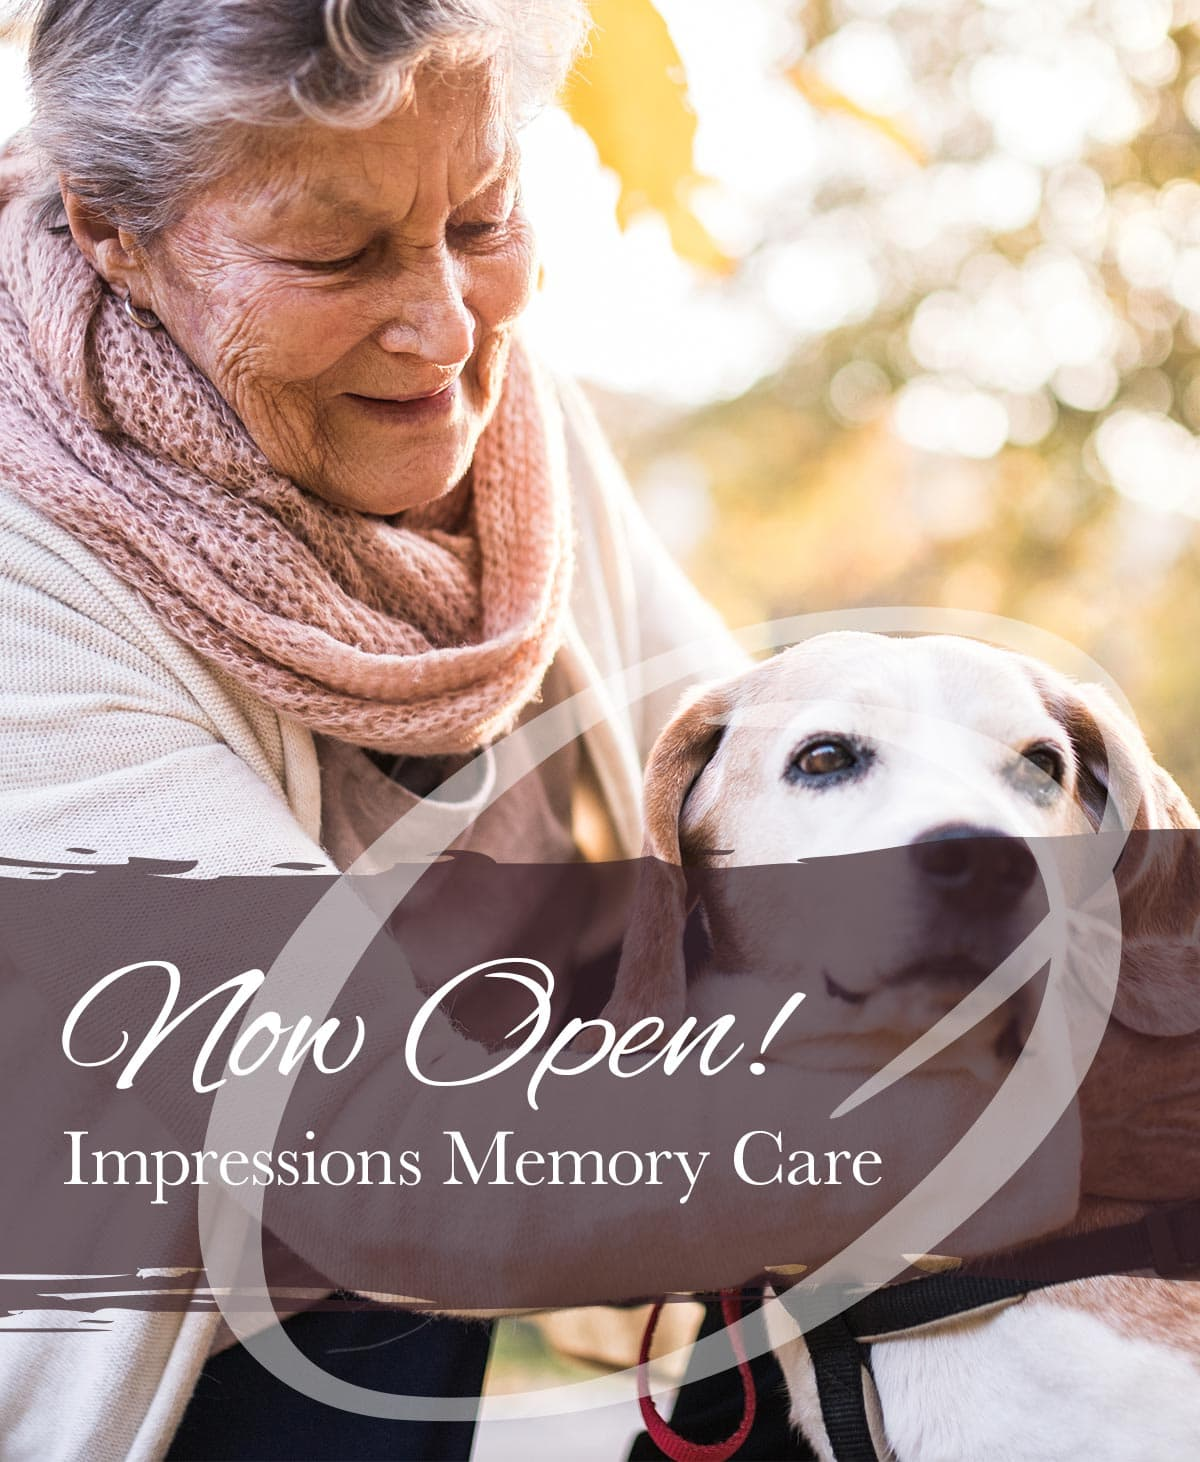 impressions-memory-care-slide-mobile-min